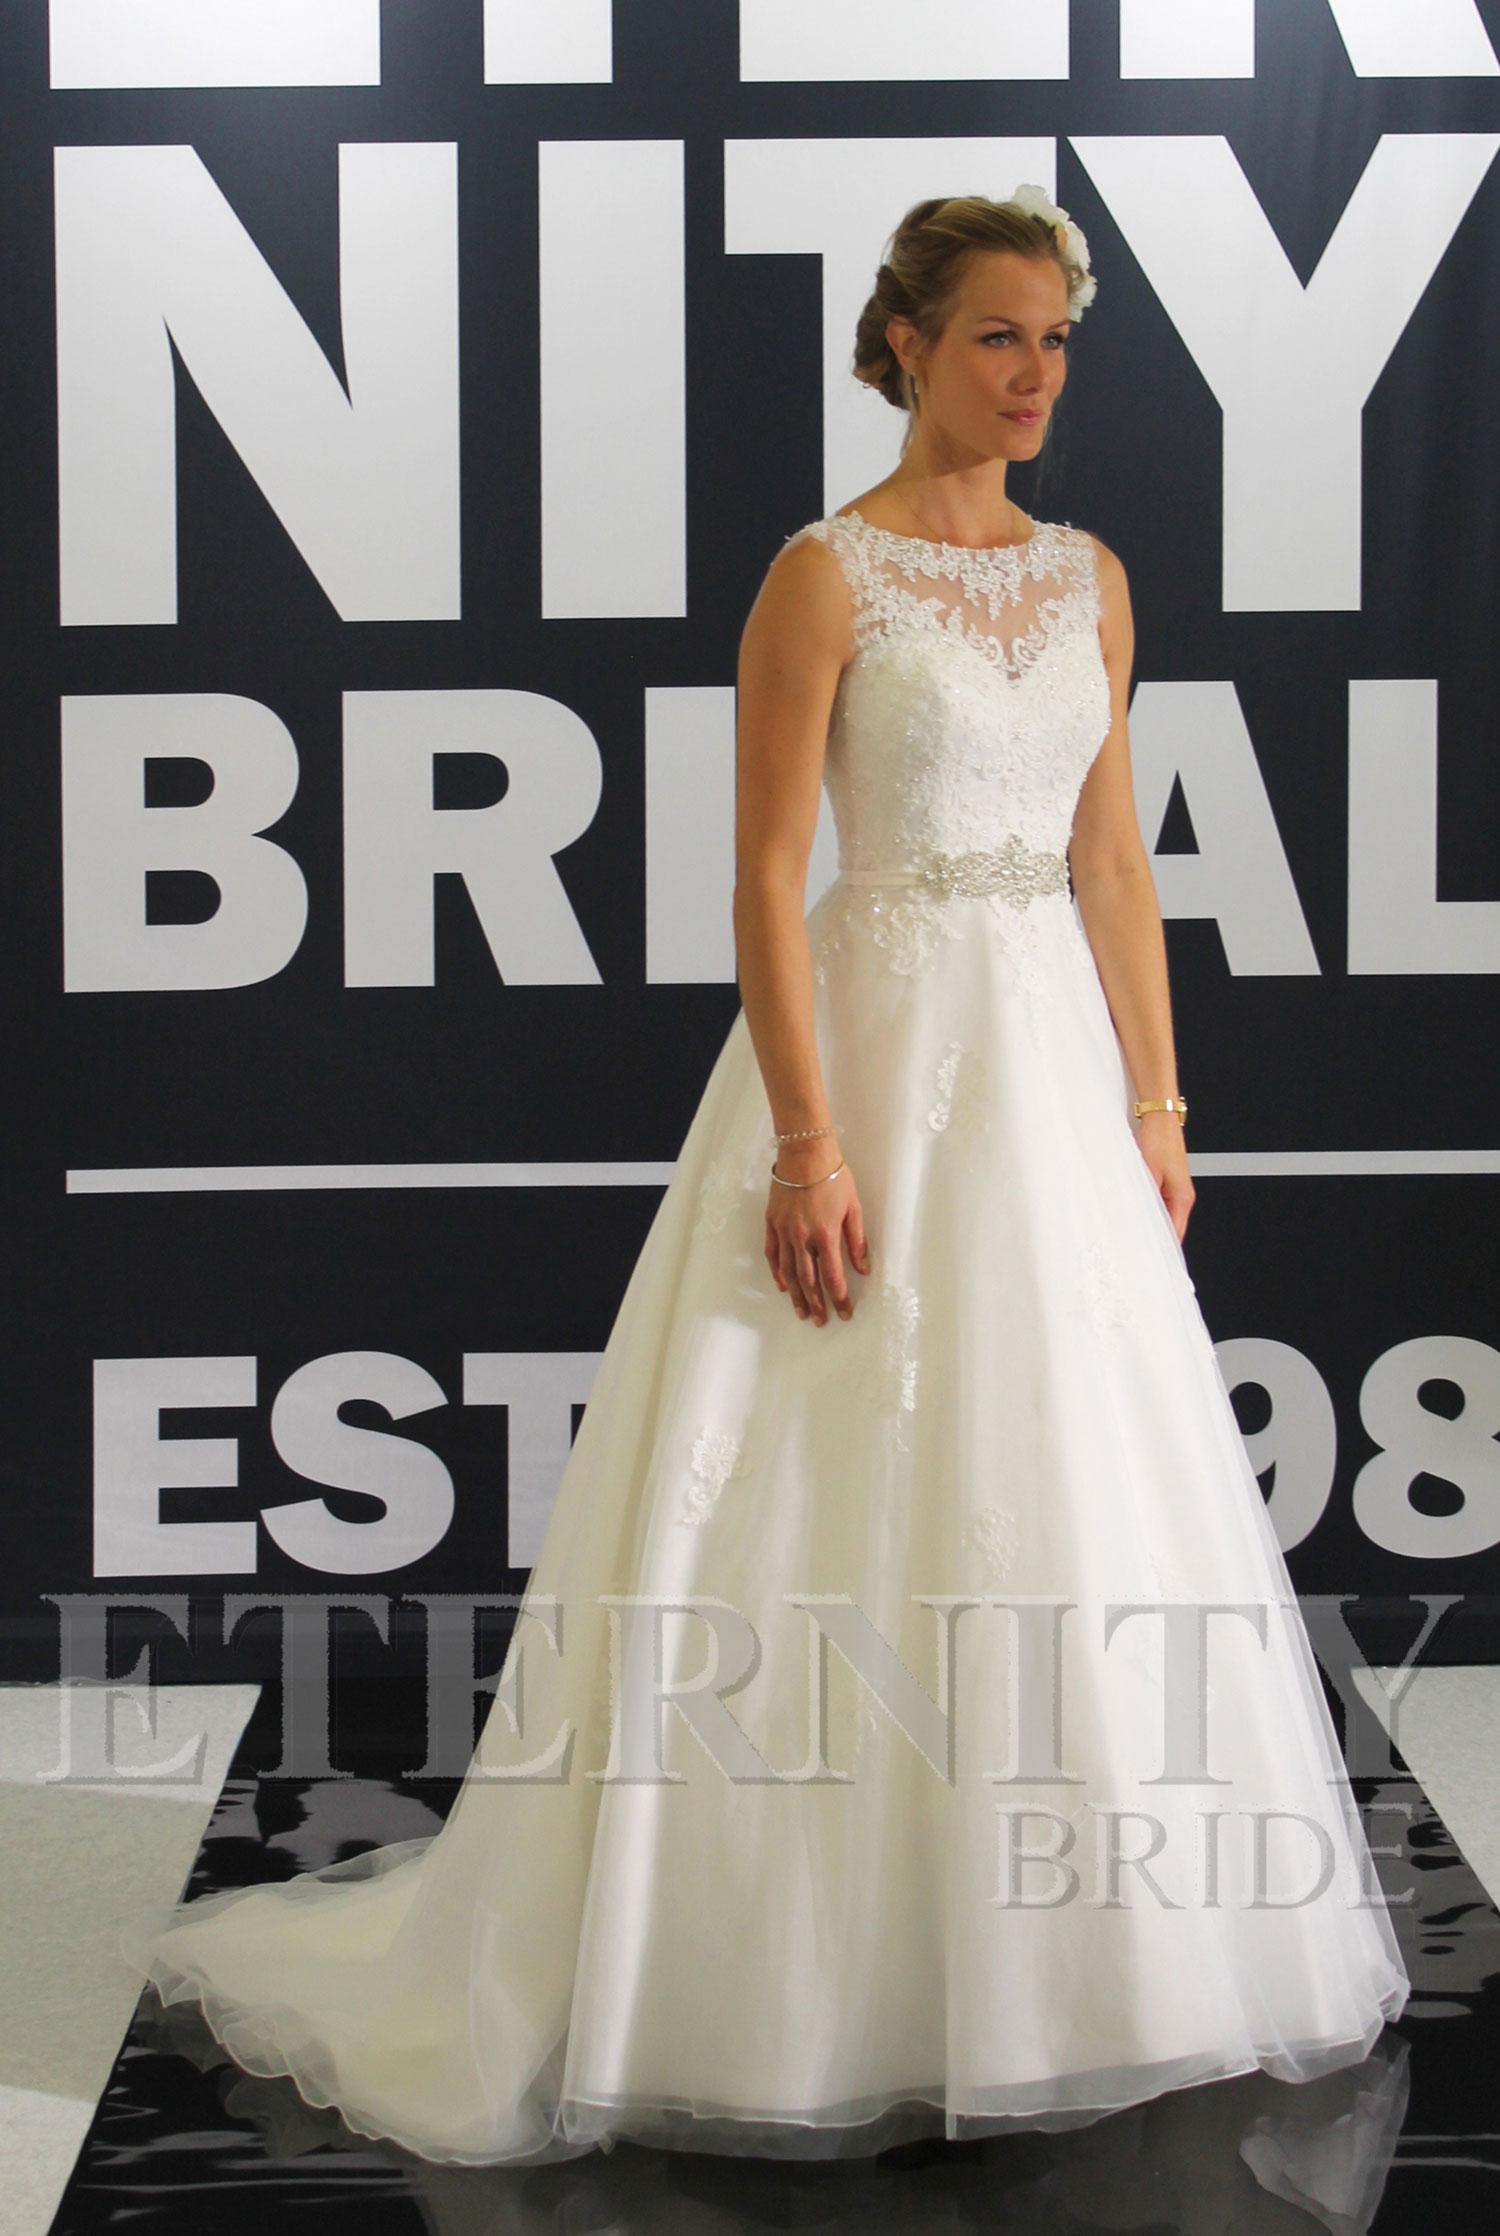 Eternity Bride D5633